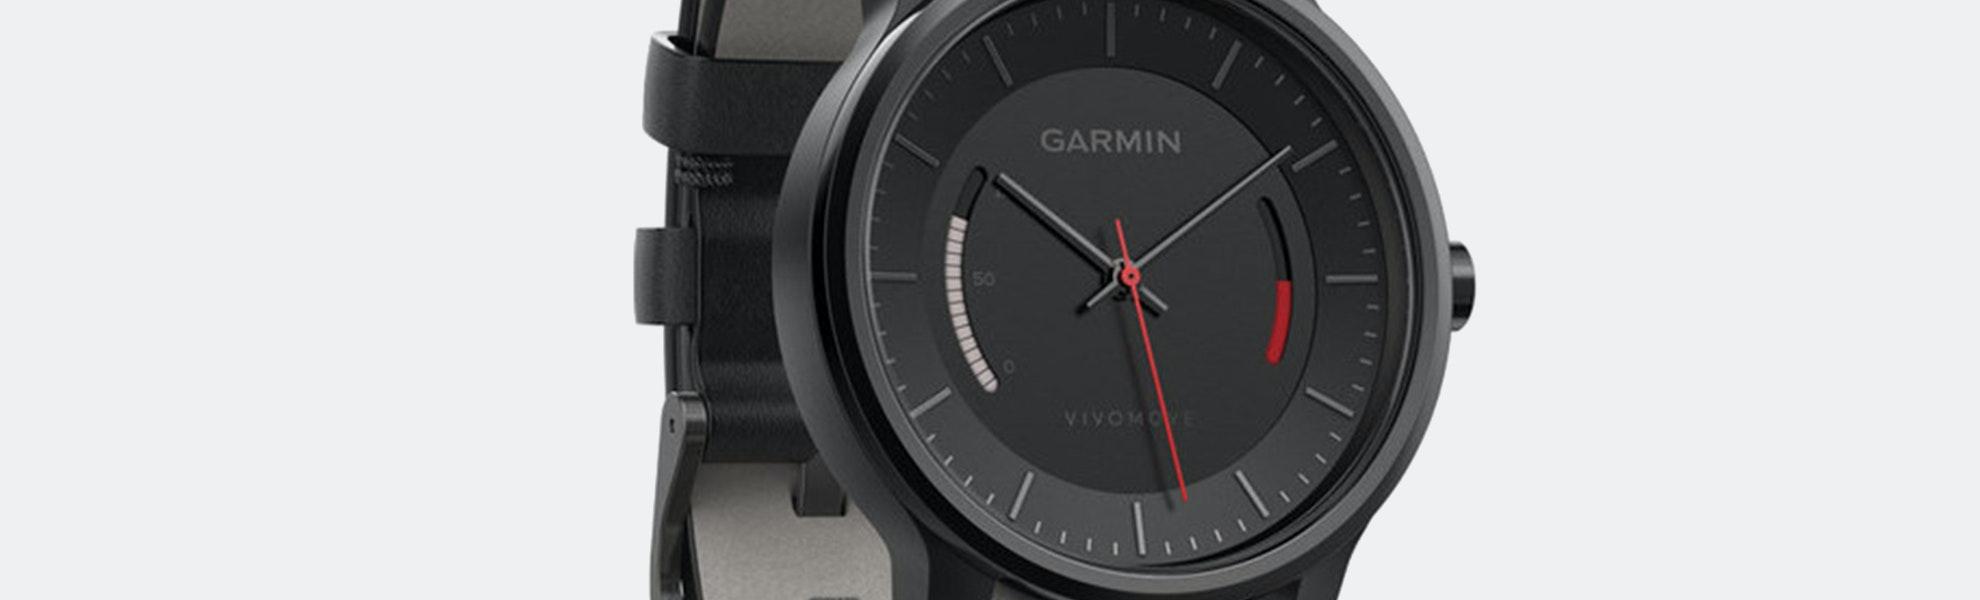 Garmin Vivomove Classic Black w/ Leather Band